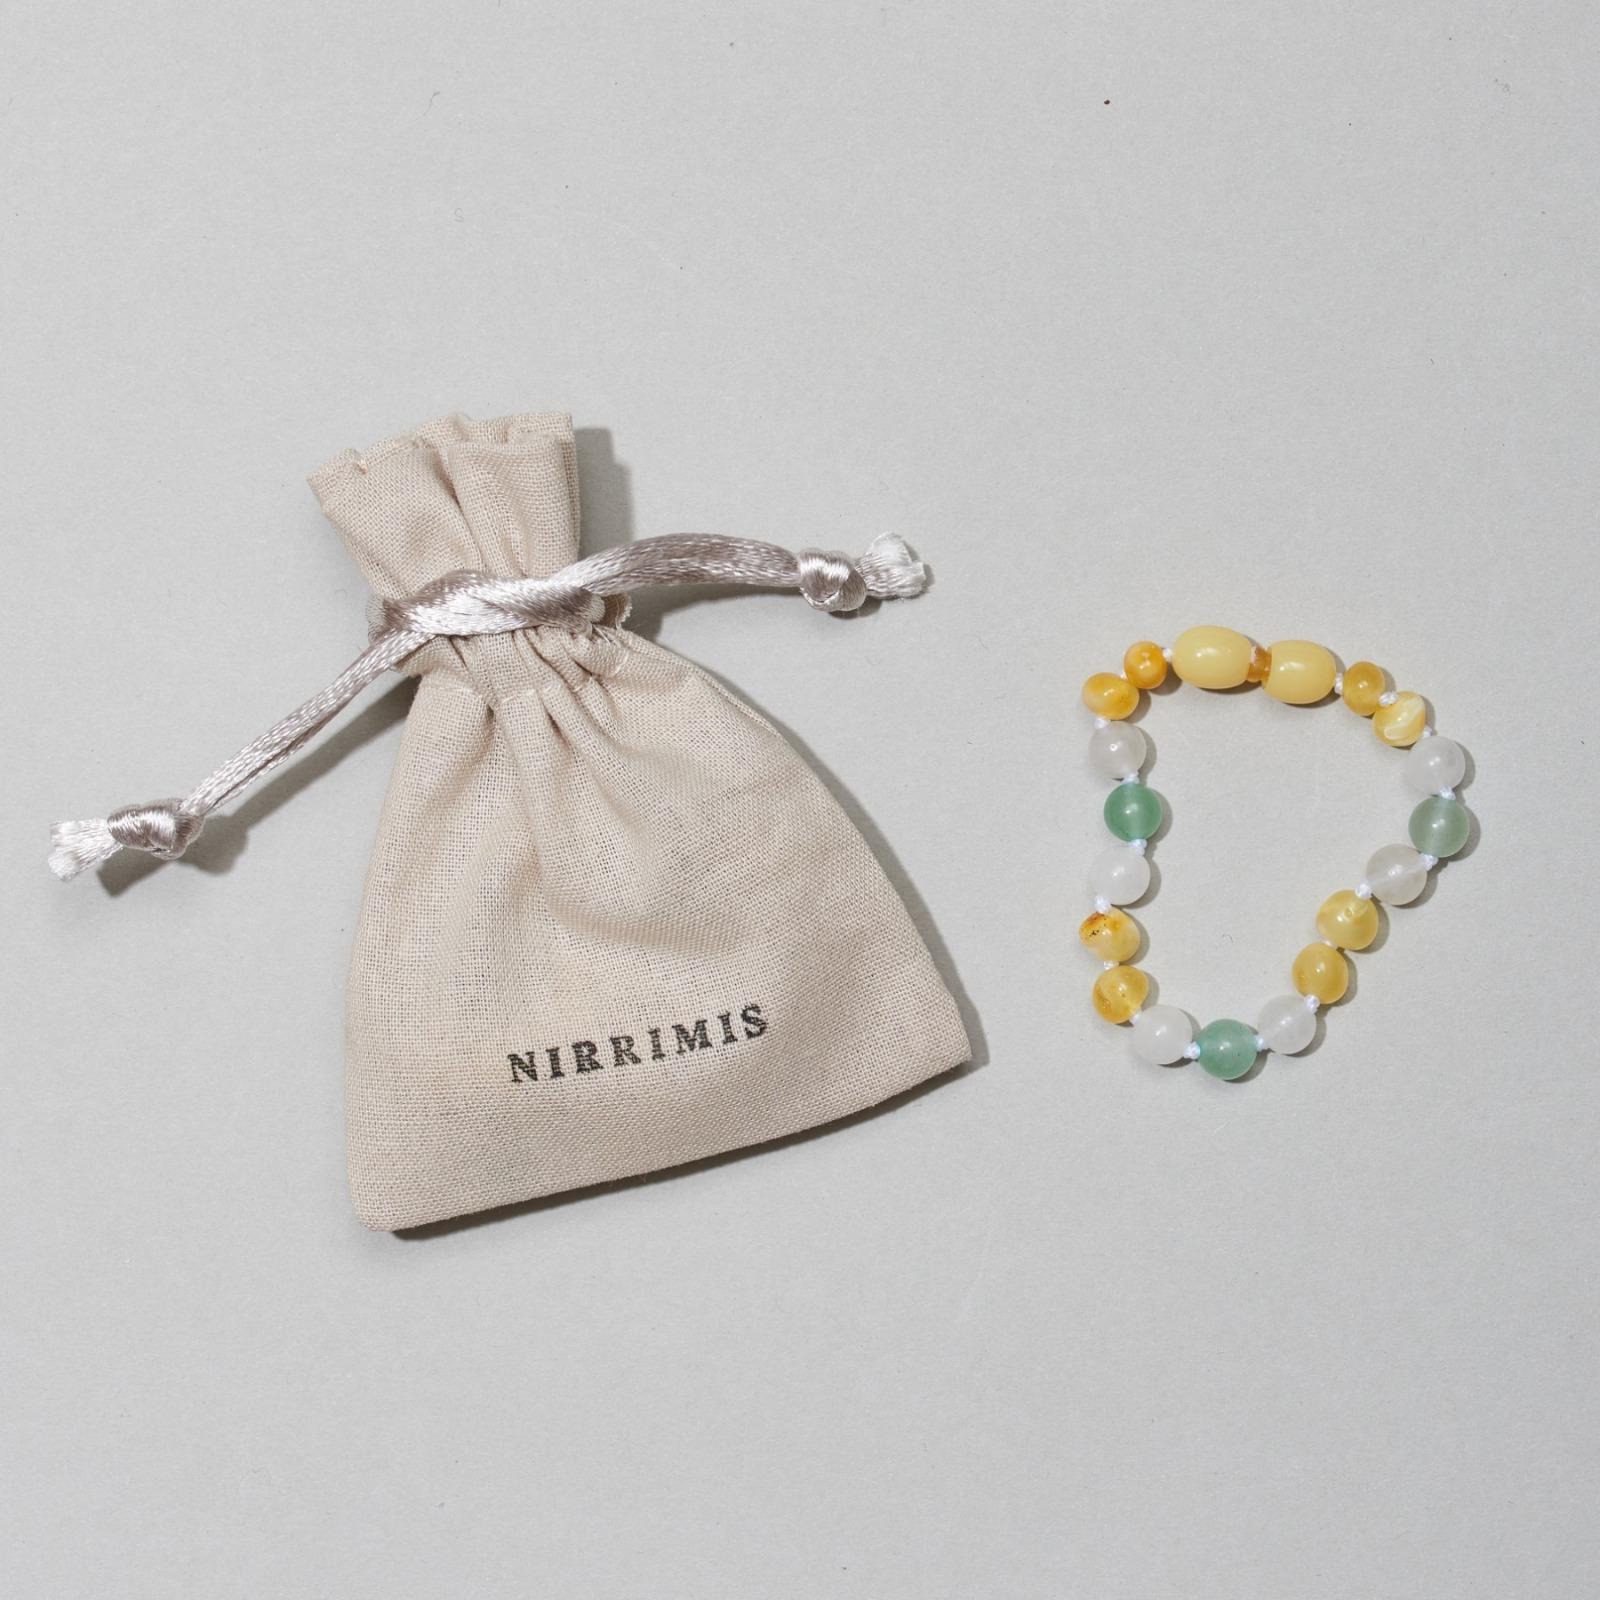 Nirrimis Armband Effie